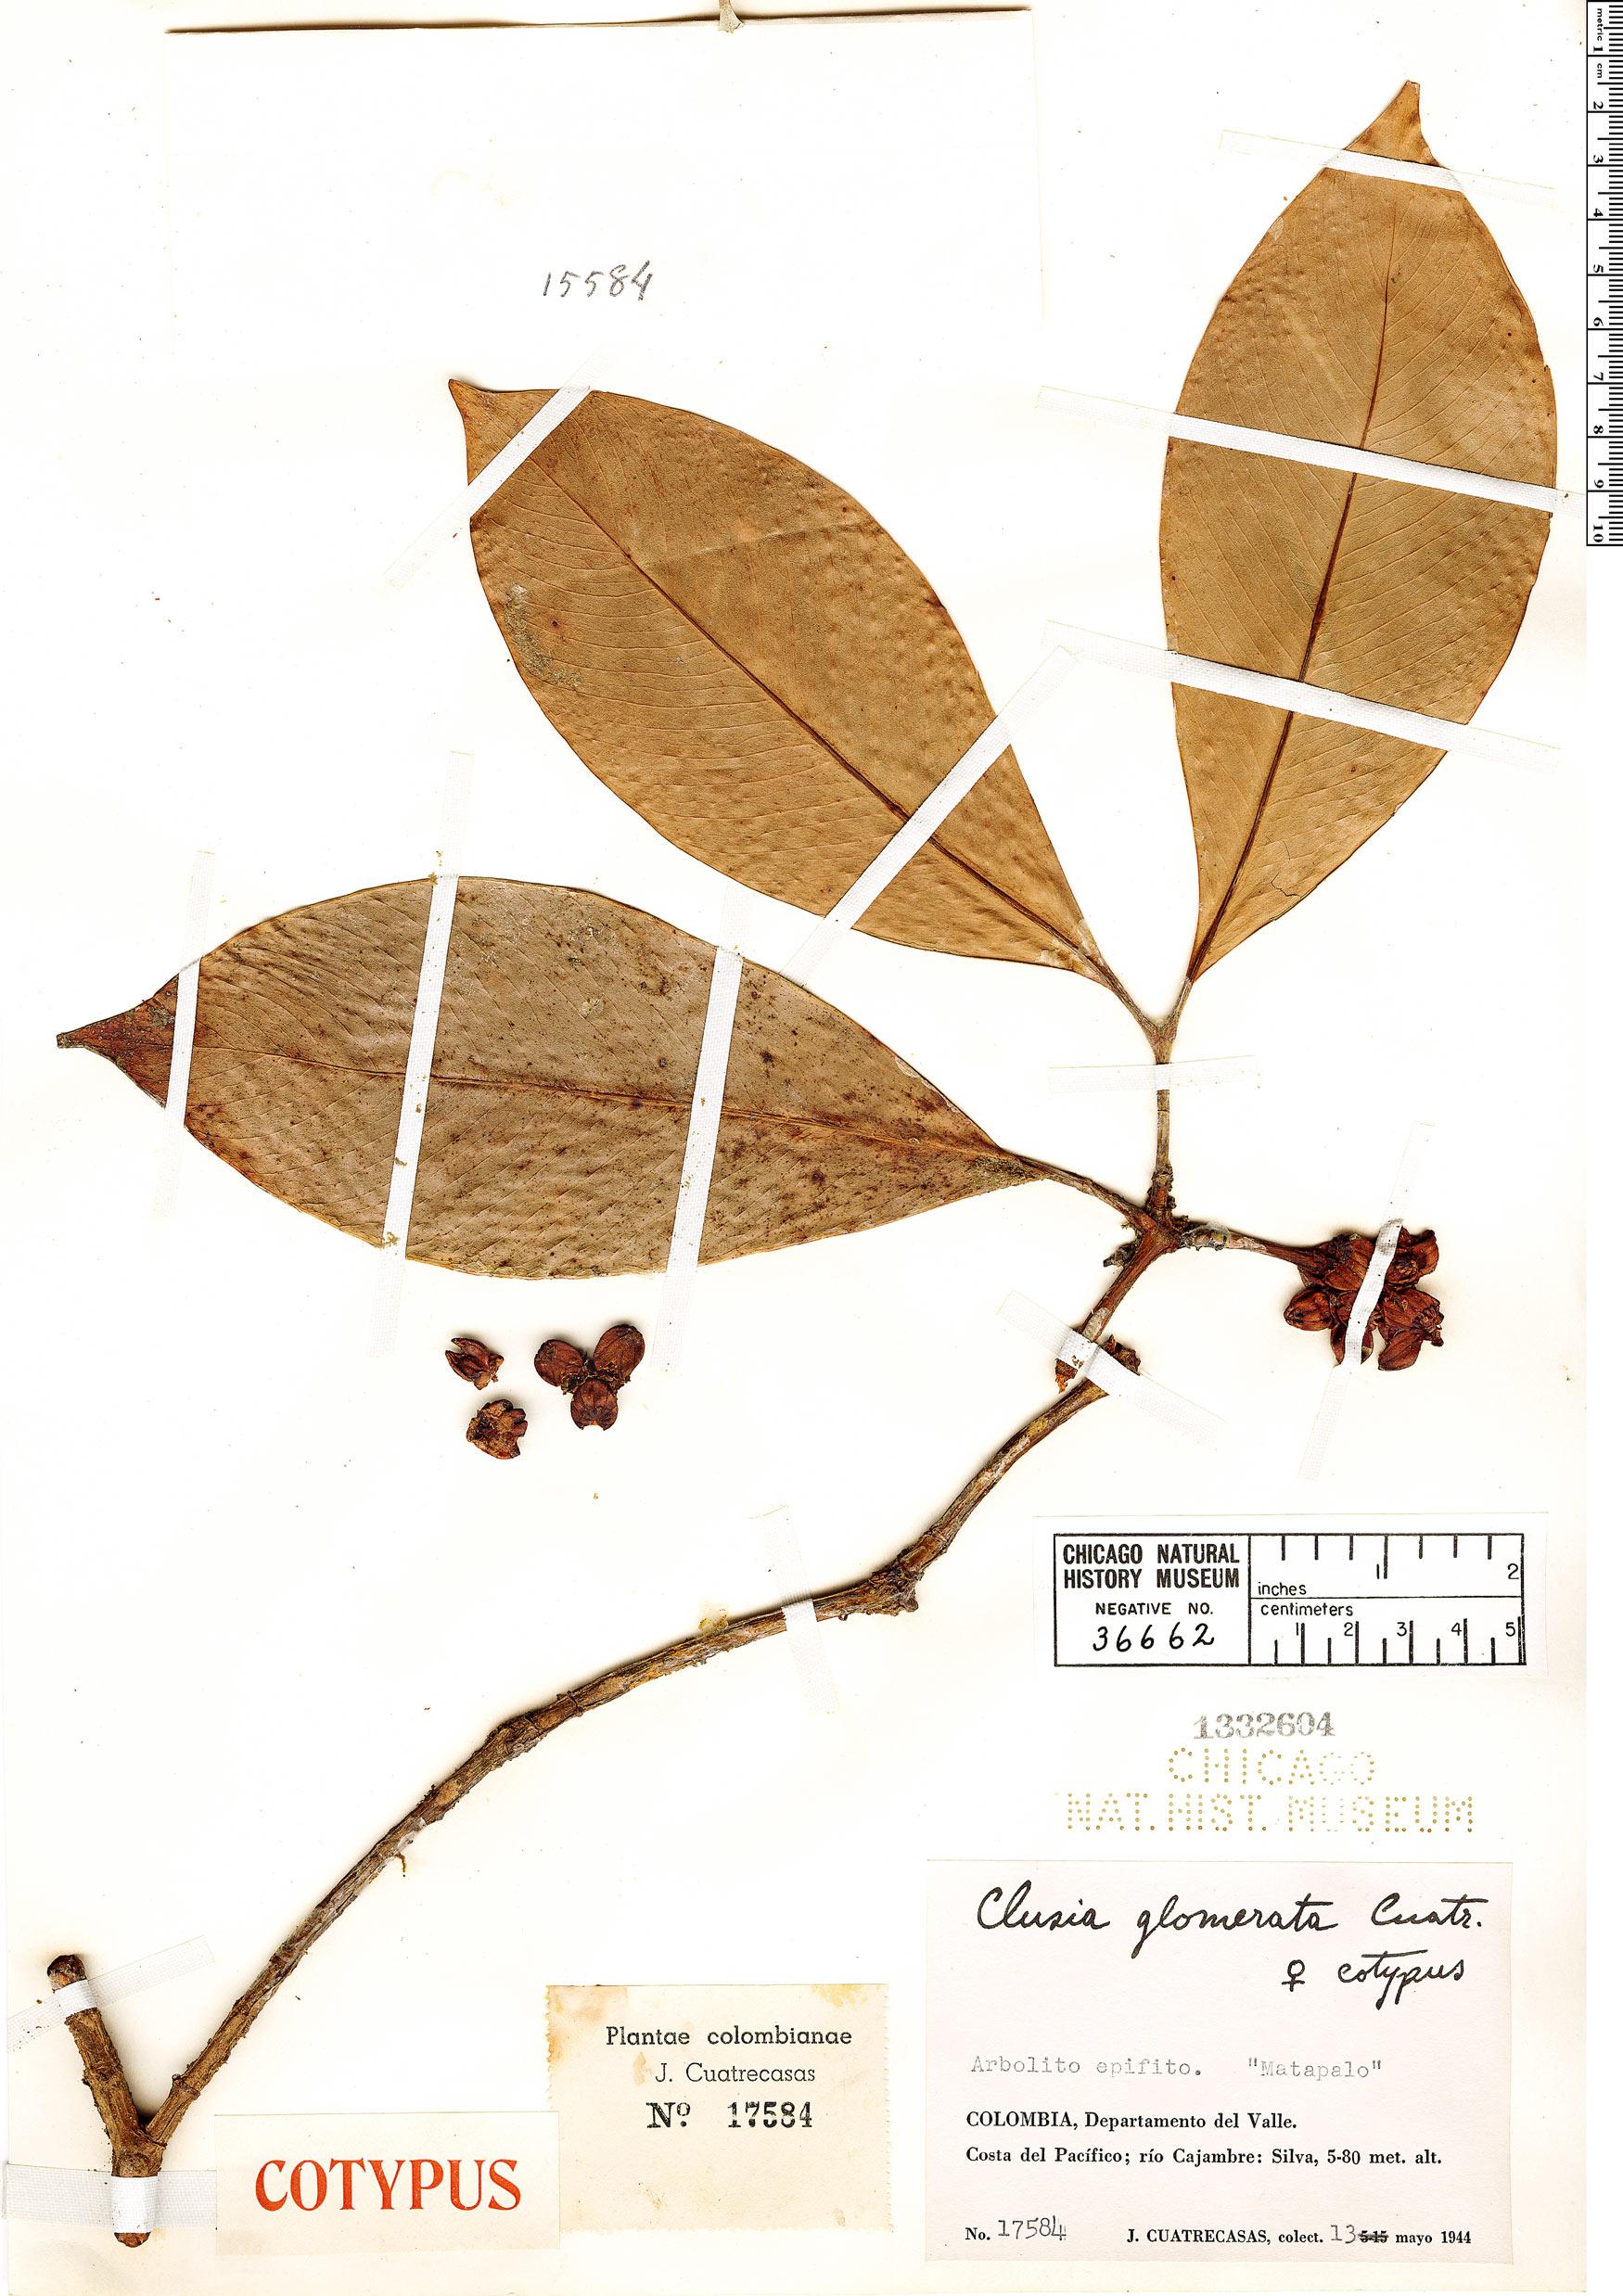 Specimen: Clusia glomerata